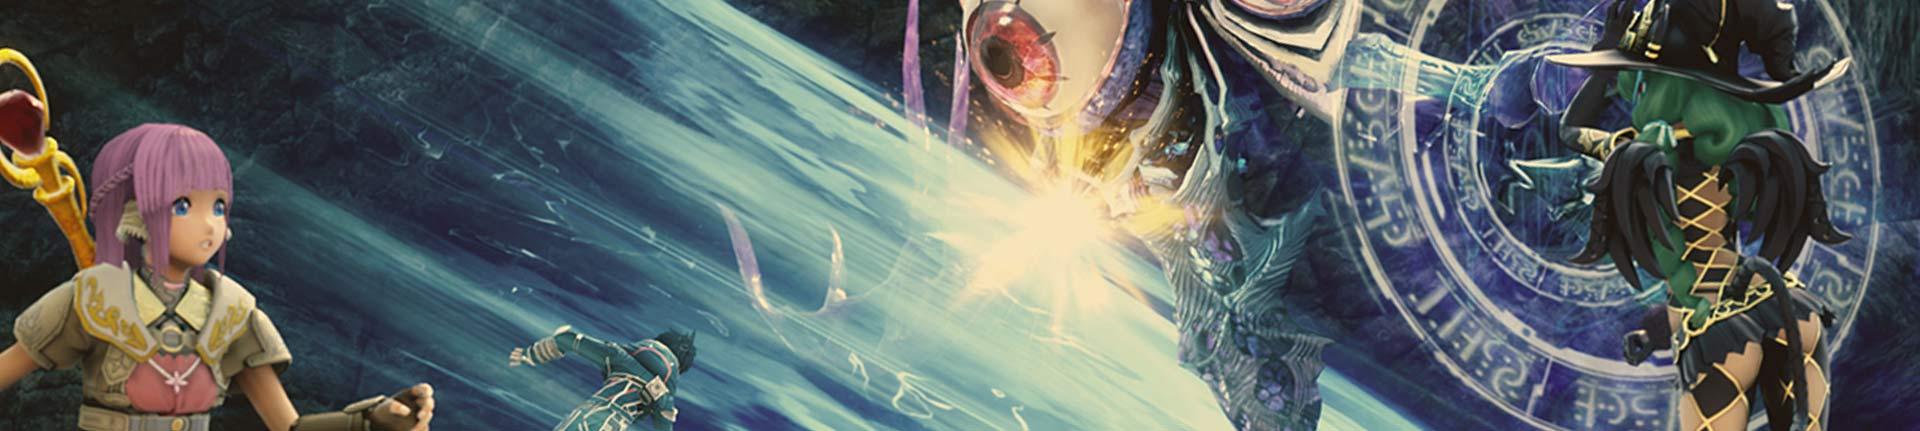 Star Ocean 5 Character Attributes Guide